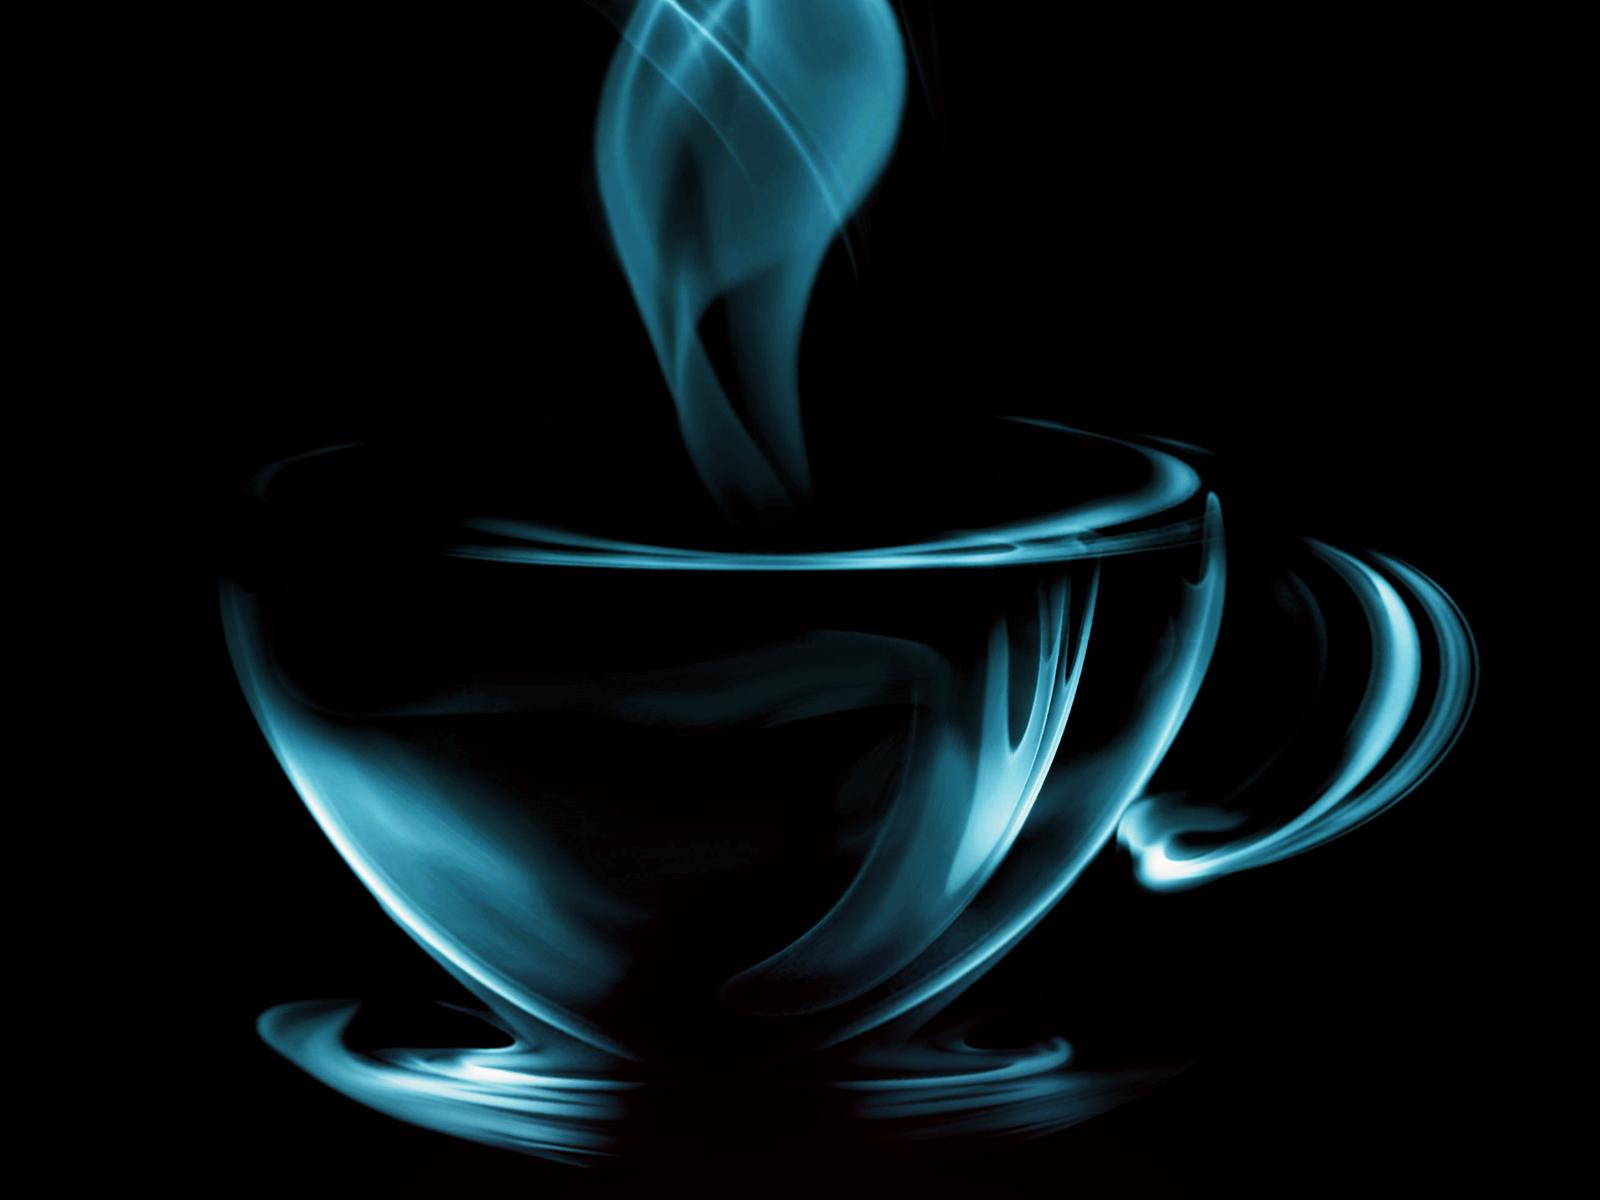 Coffee Cup Wallpaper Backgrounds - WallpaperSafari